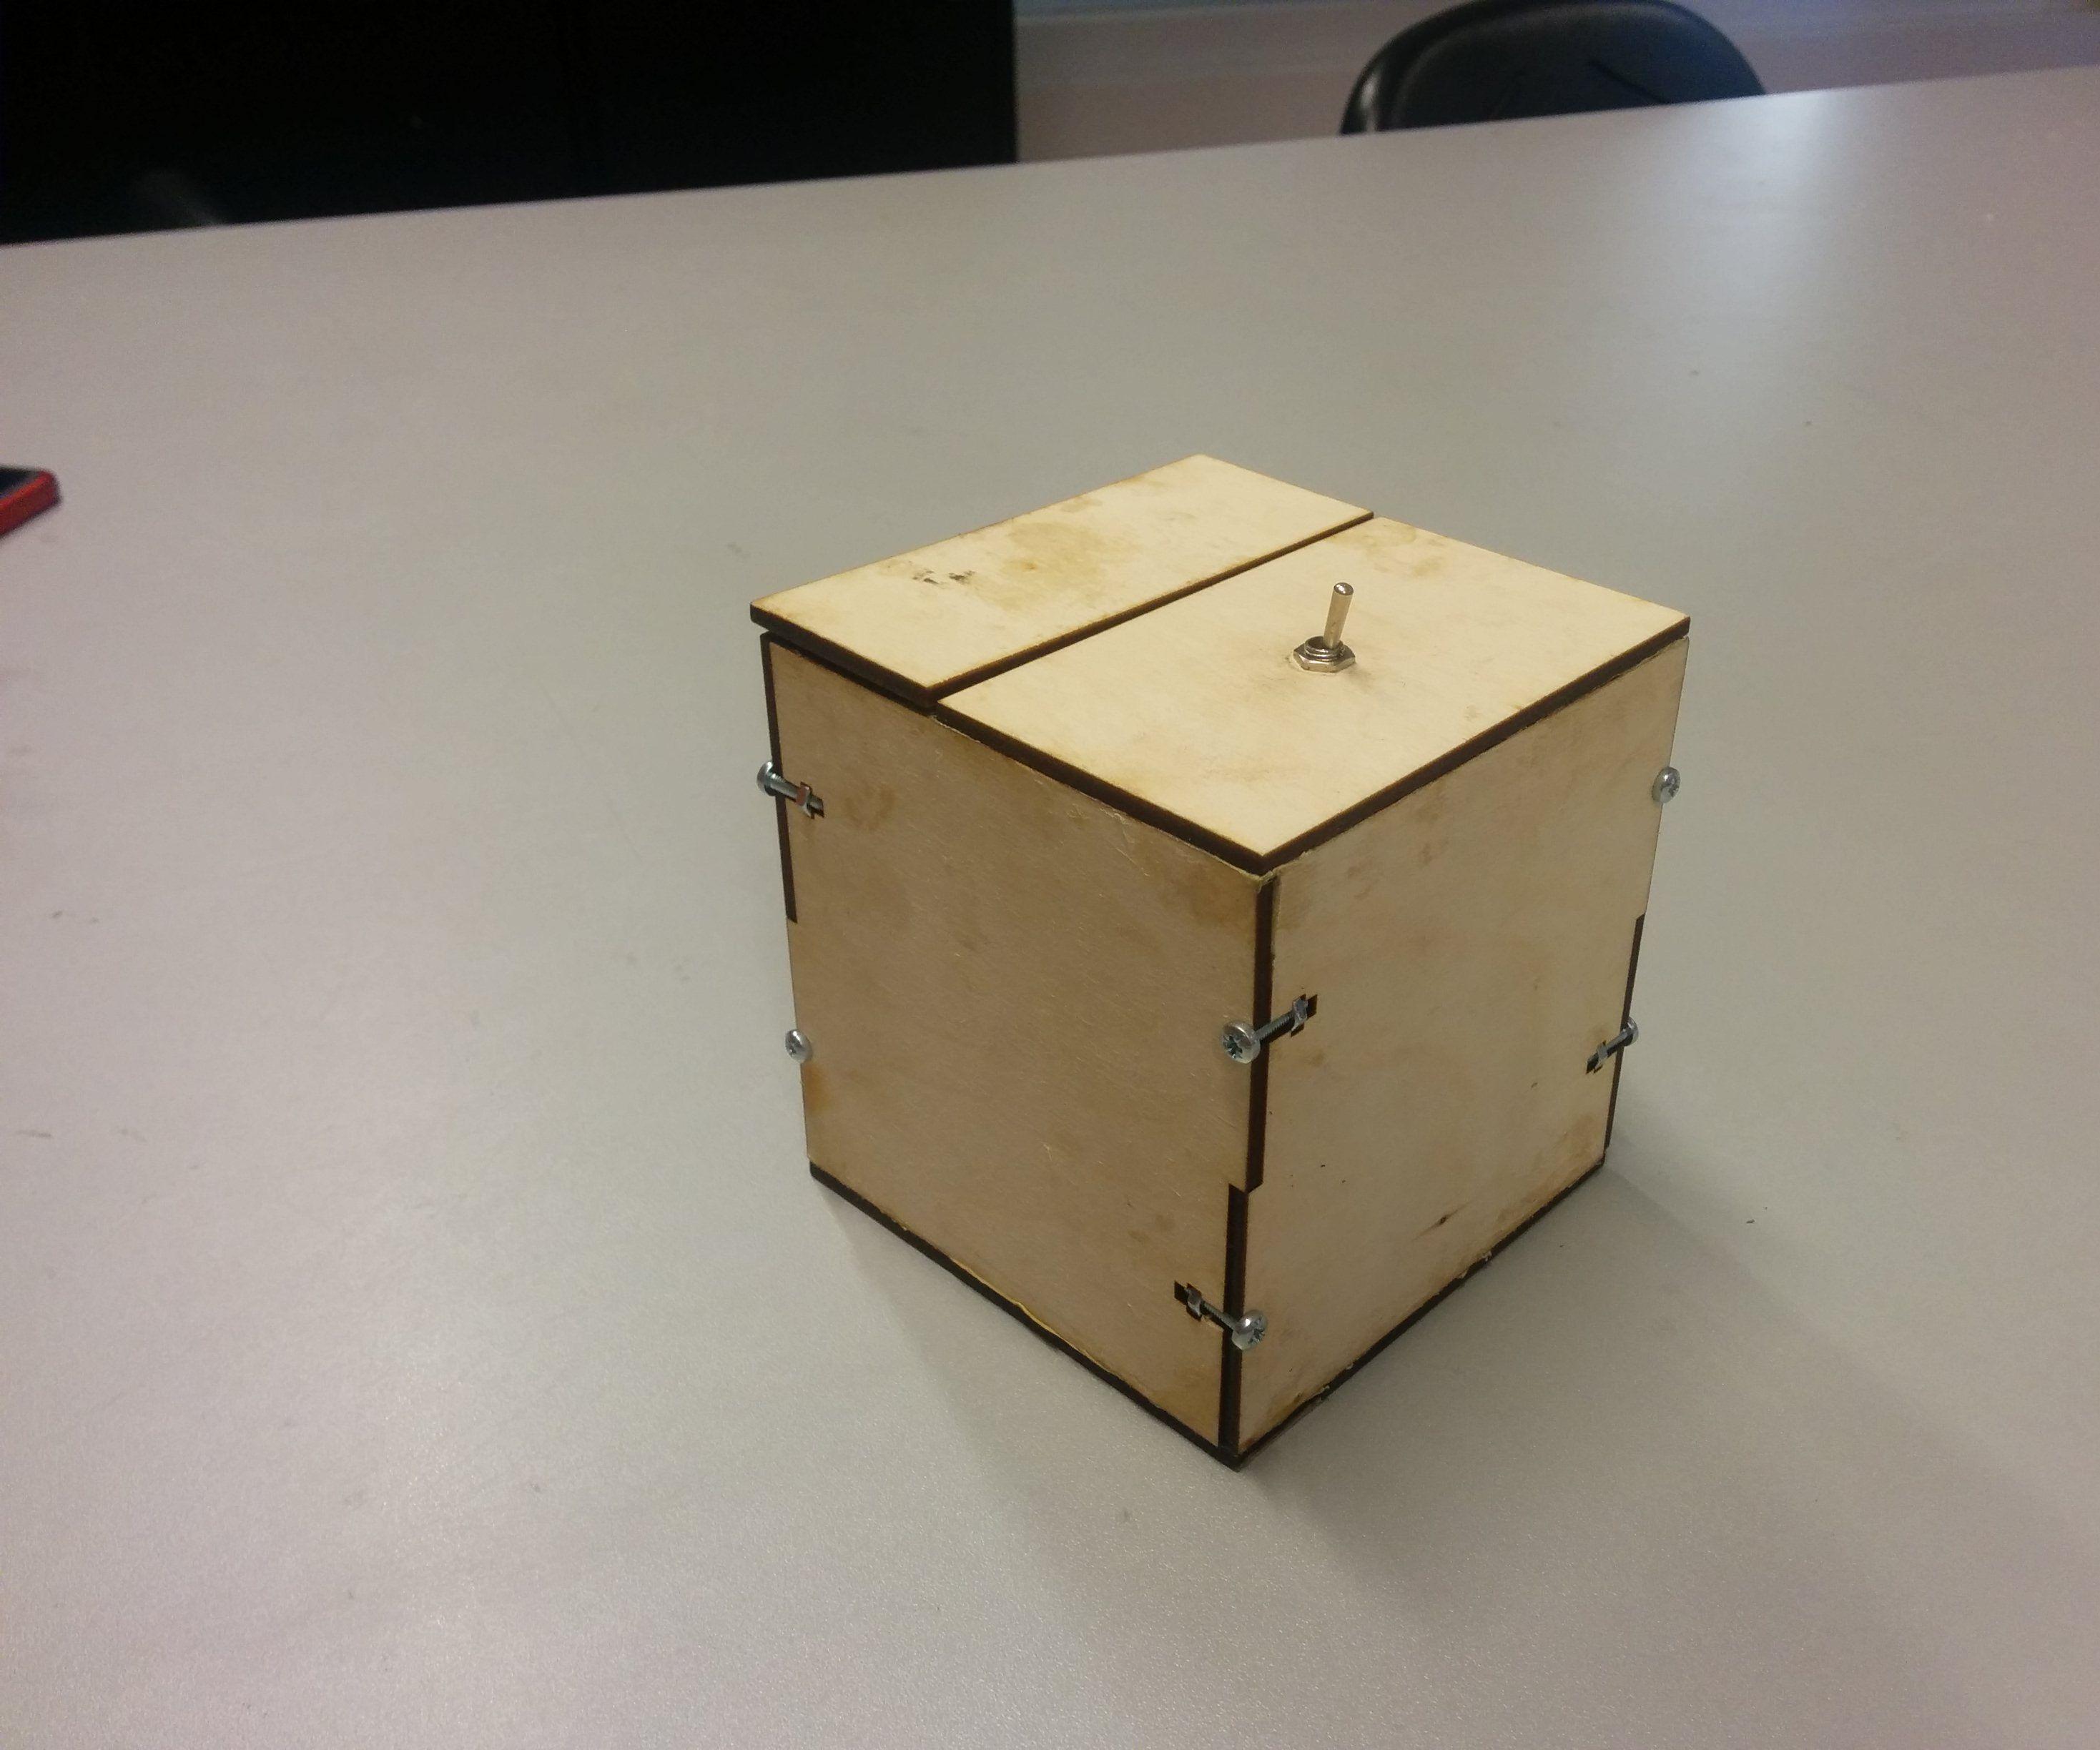 Useless useless box